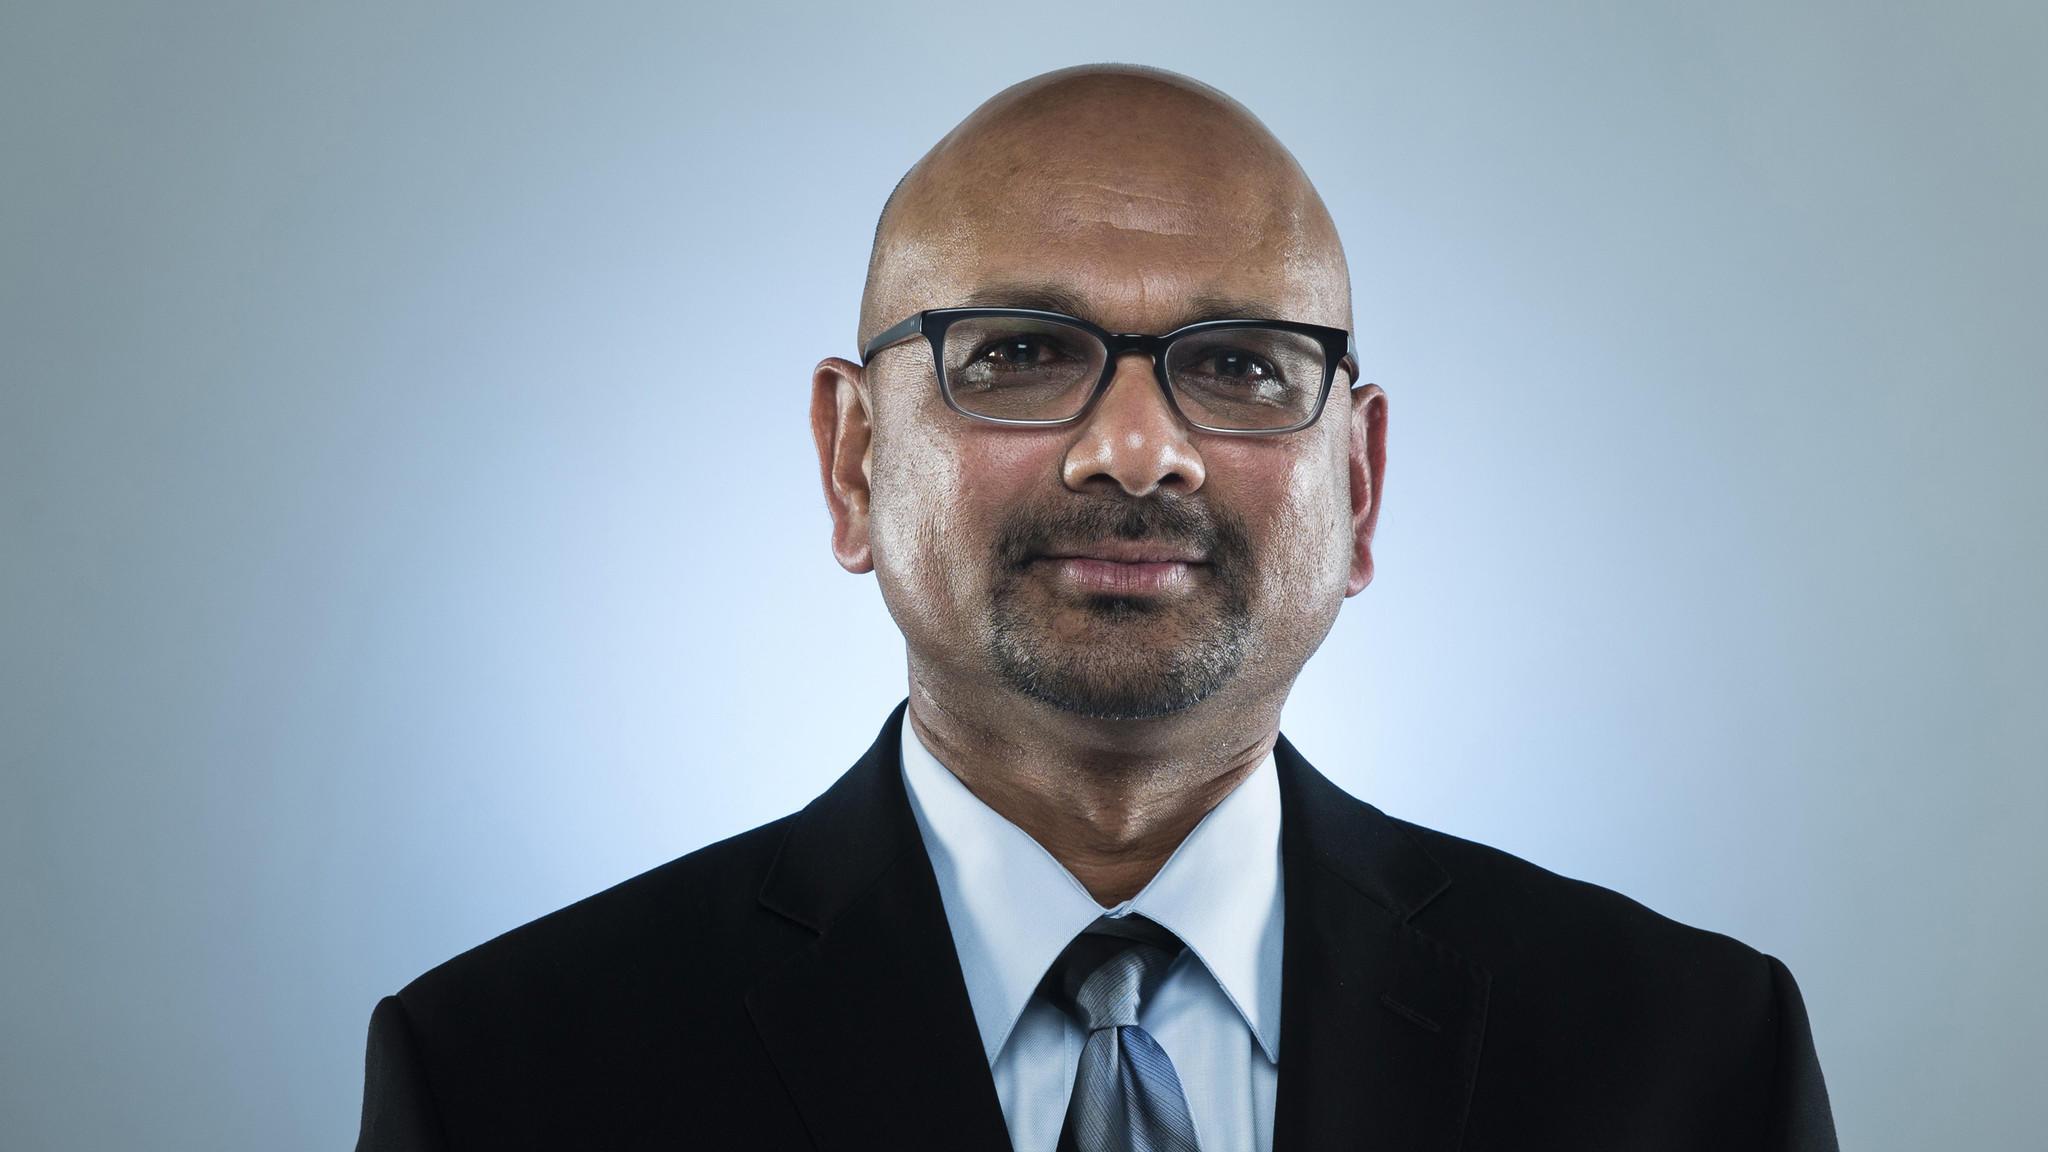 Indian-American editor Davan Maharaj